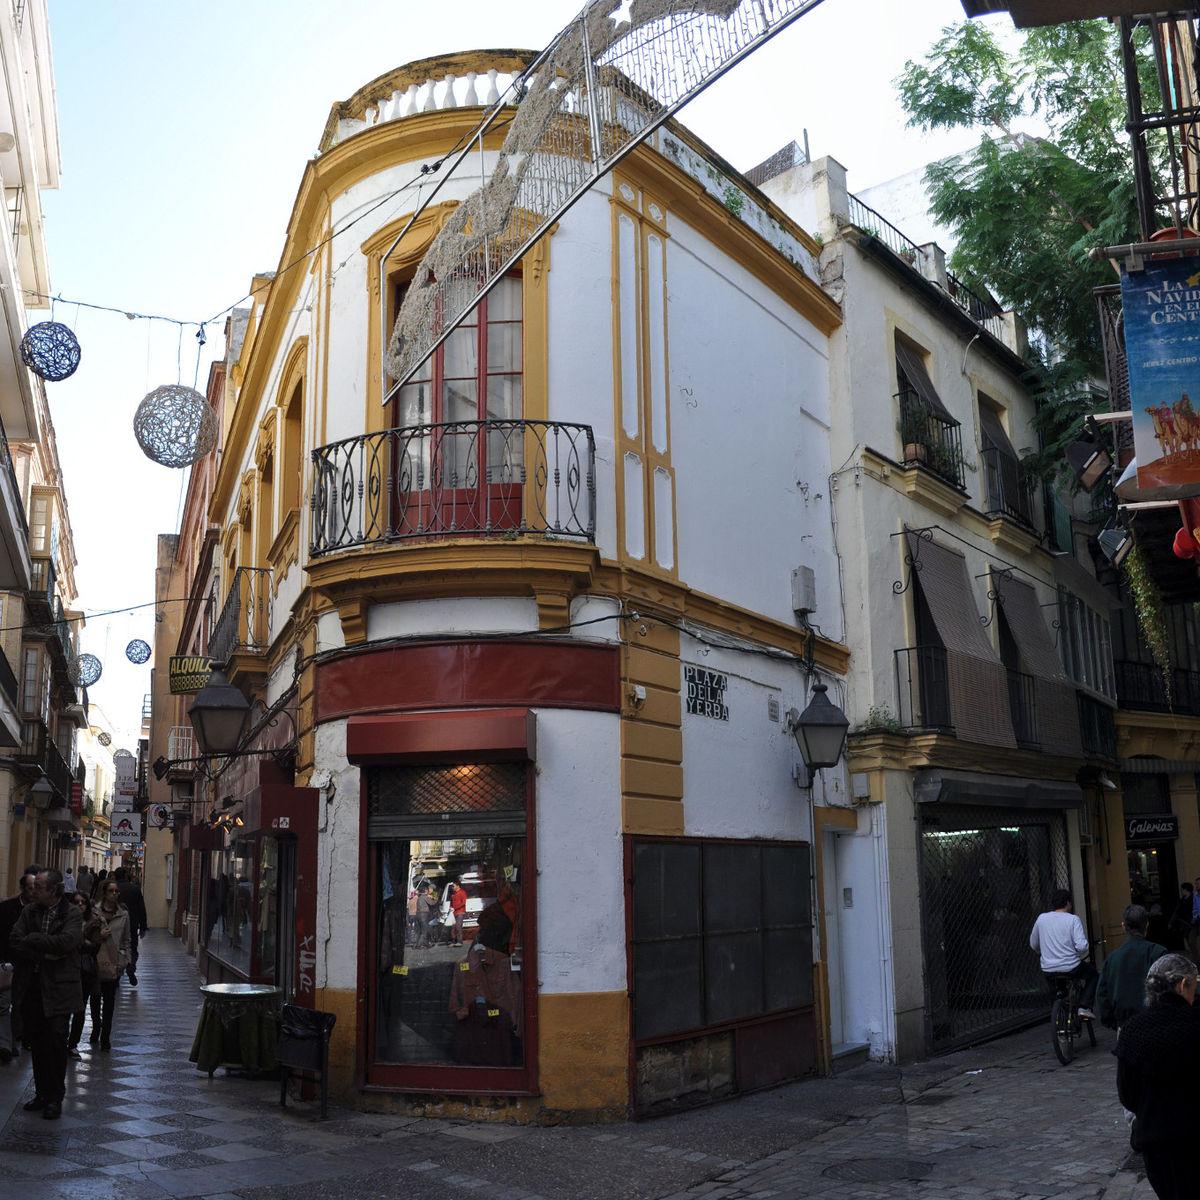 Calle algarve wikipedia la enciclopedia libre for Calle prado jerez madrid